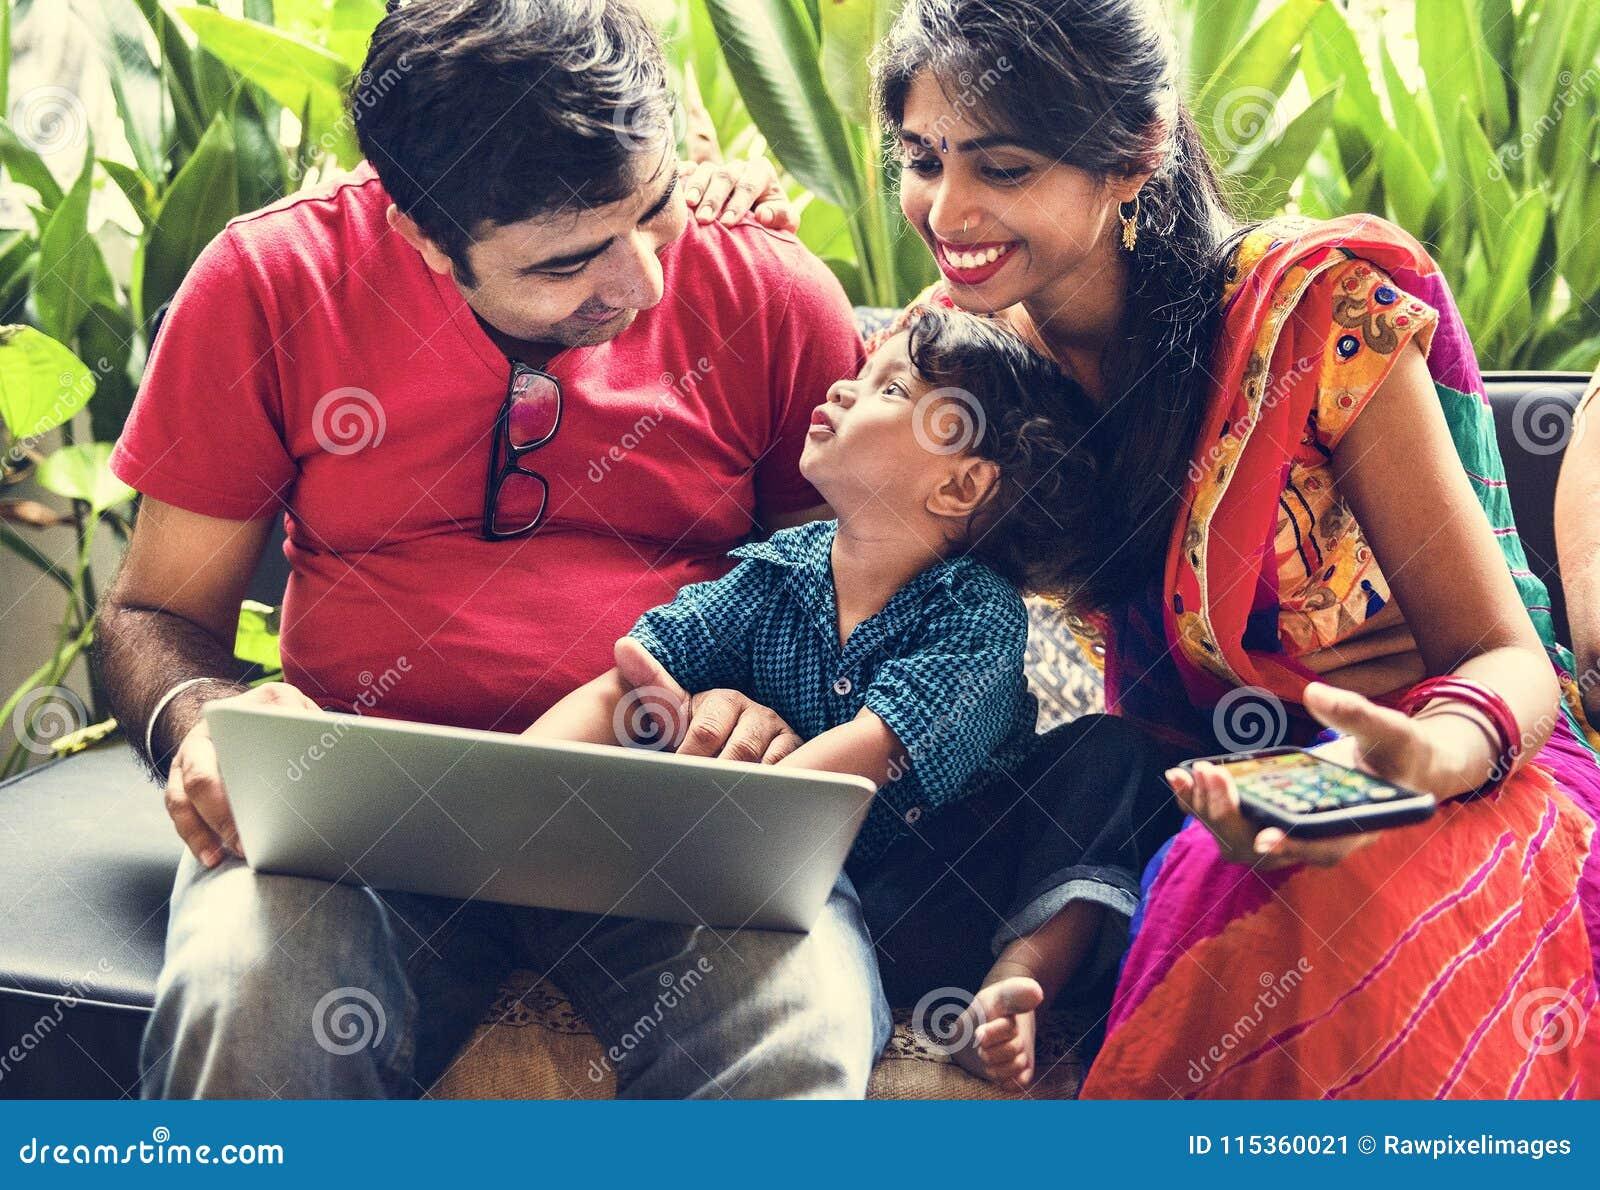 2,000+ Free Happy Family & Family Images - Pixabay